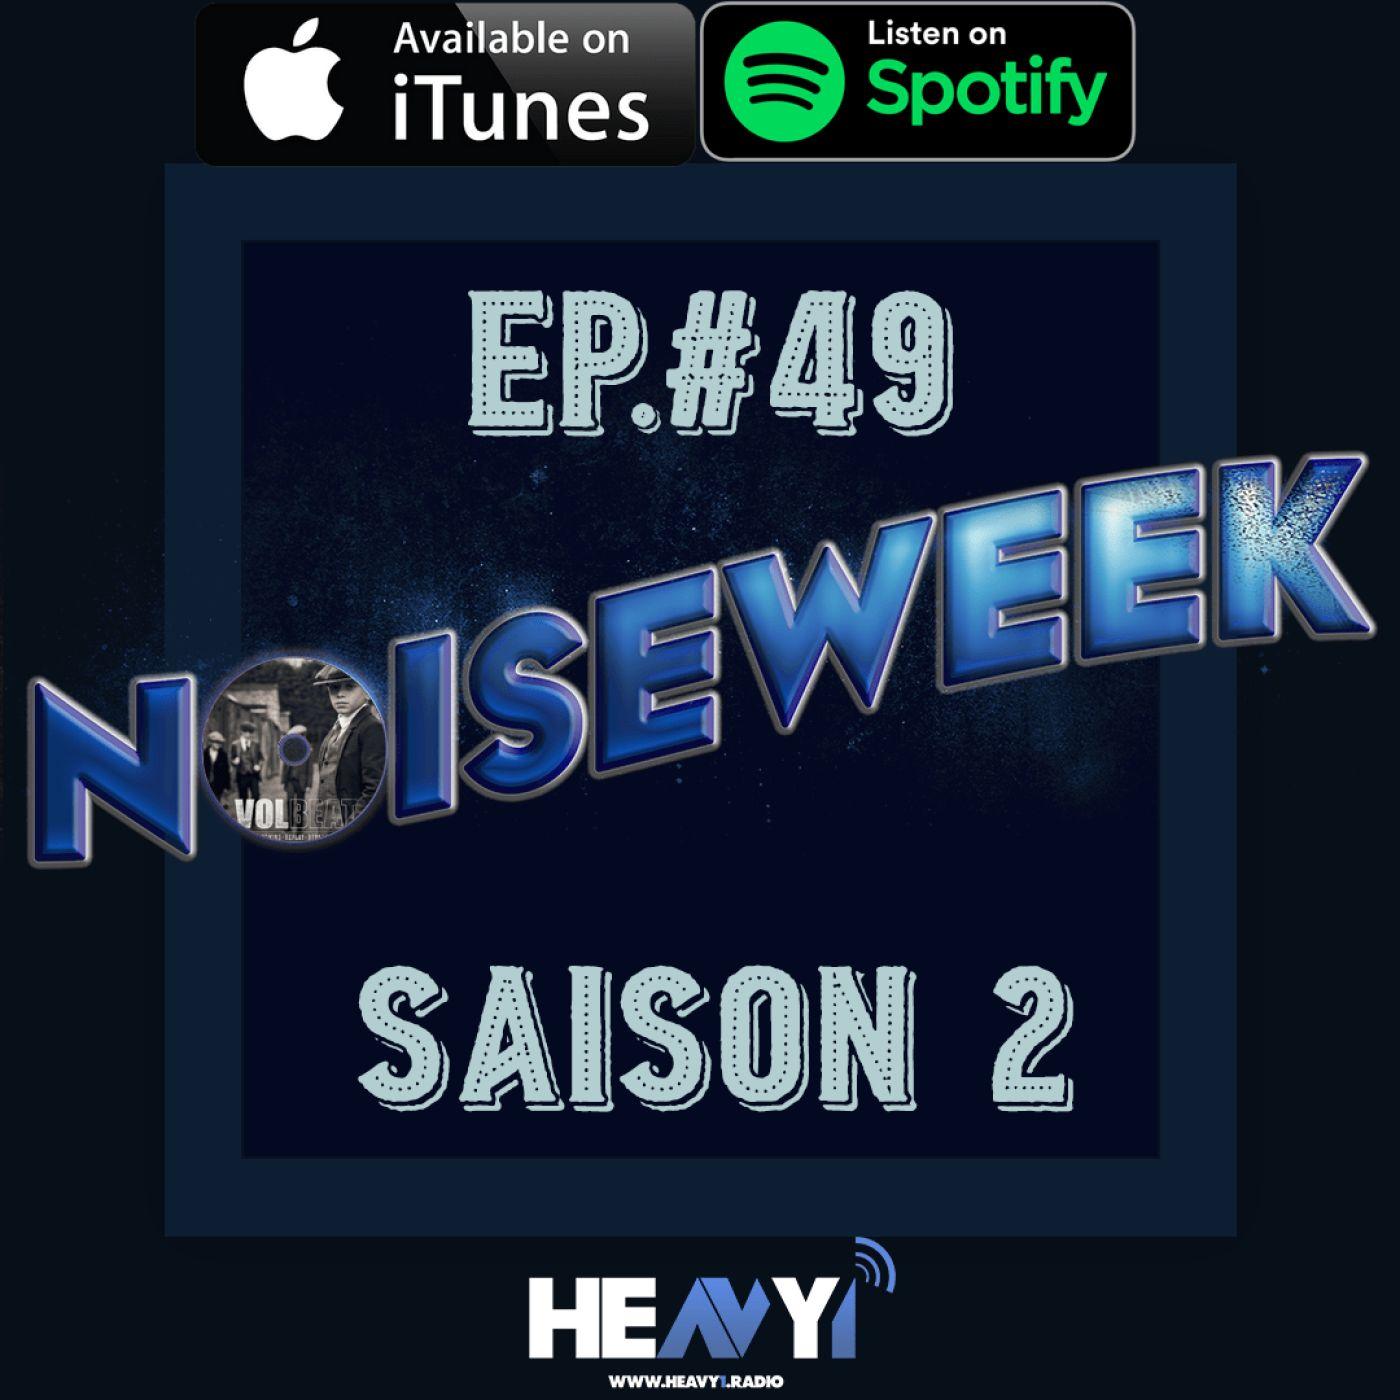 Noiseweek #49 Saison 2